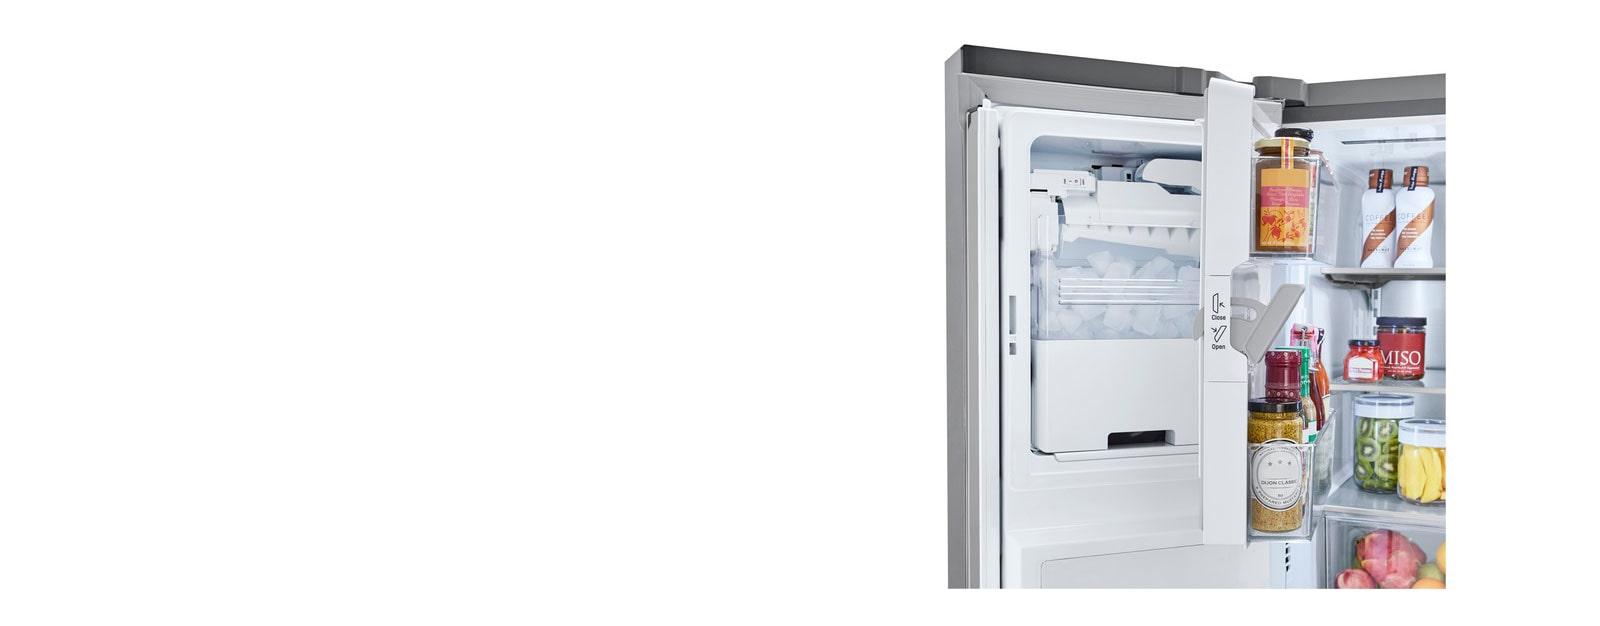 Refrigerator interior showcasing Slim SpacePlus® Ice System